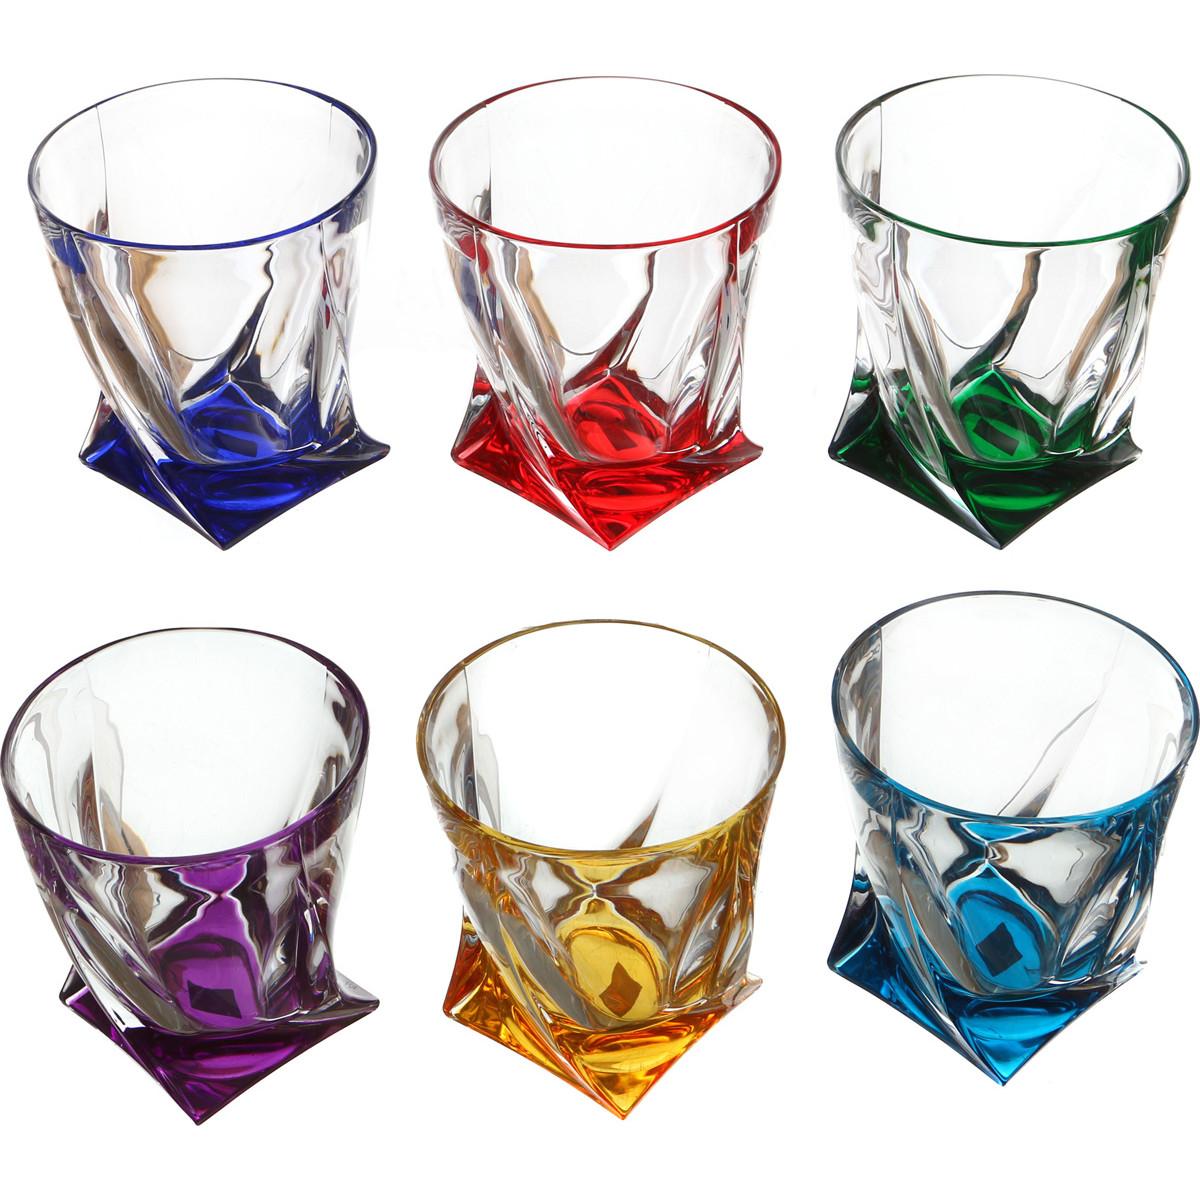 {} Crystalite Bohemia Набор стаканов для виски Cairo (10 см - 6 шт) crystalite bohemia набор для виски lewin набор